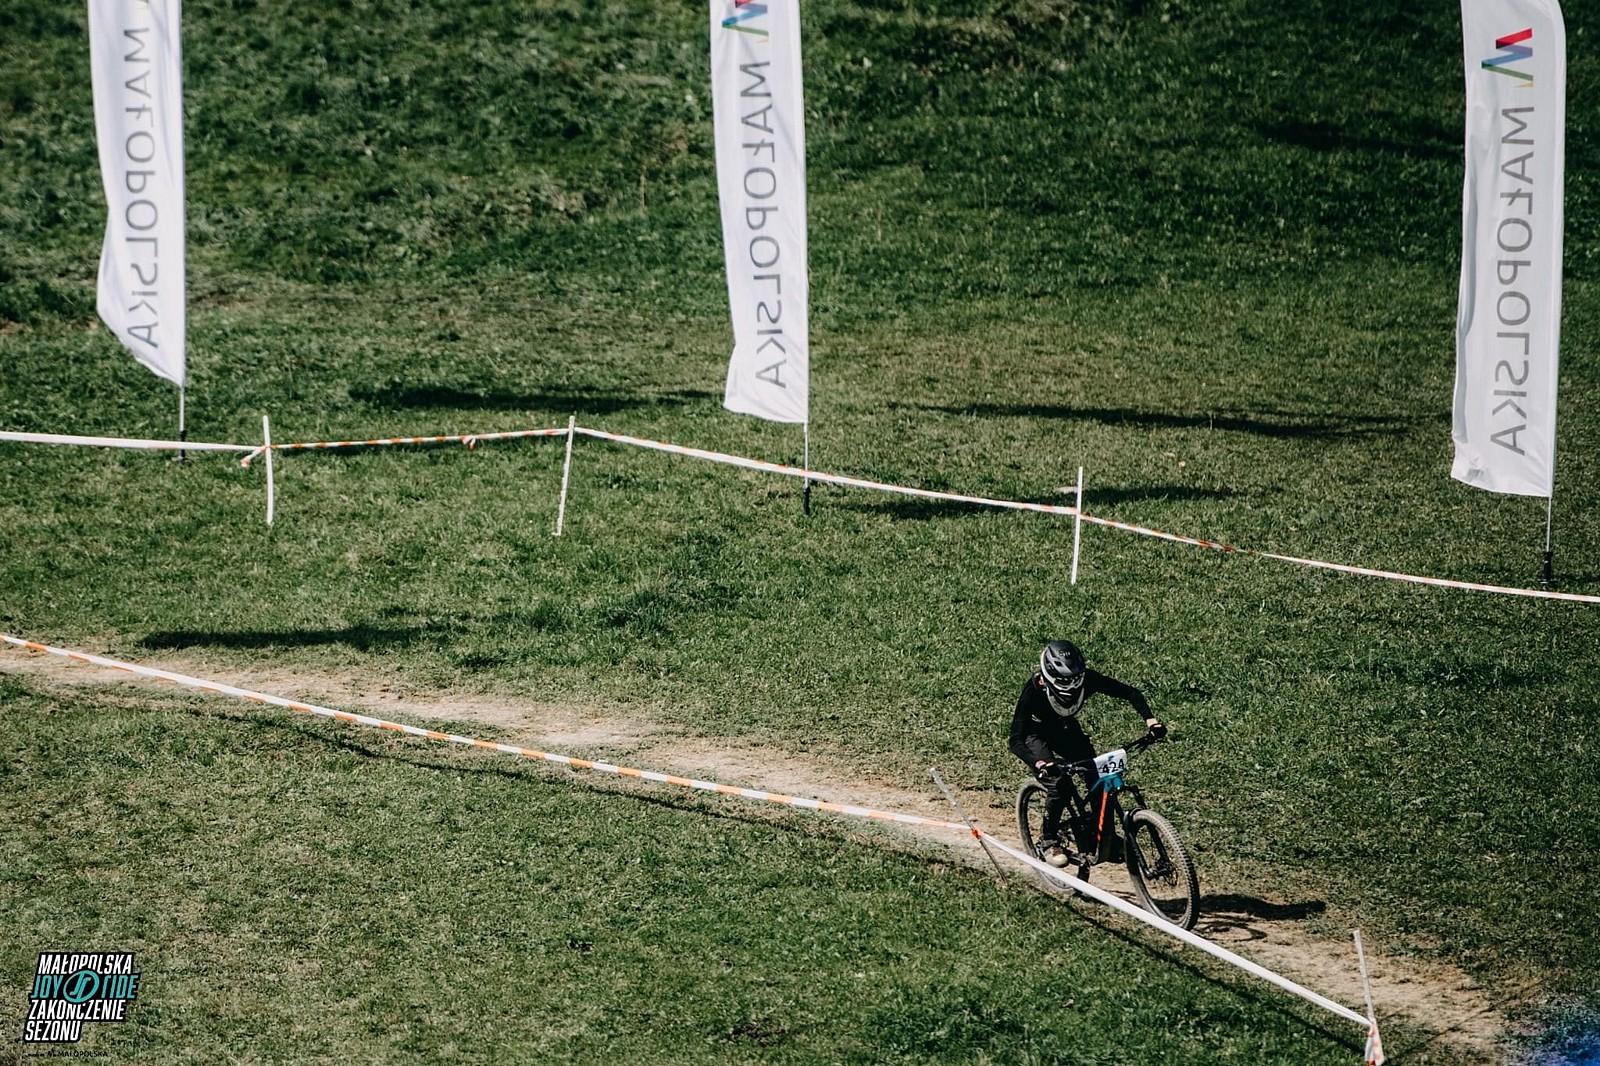 Joy Ride Zakopane 3 - bartek_zgr - Mountain Biking Pictures - Vital MTB